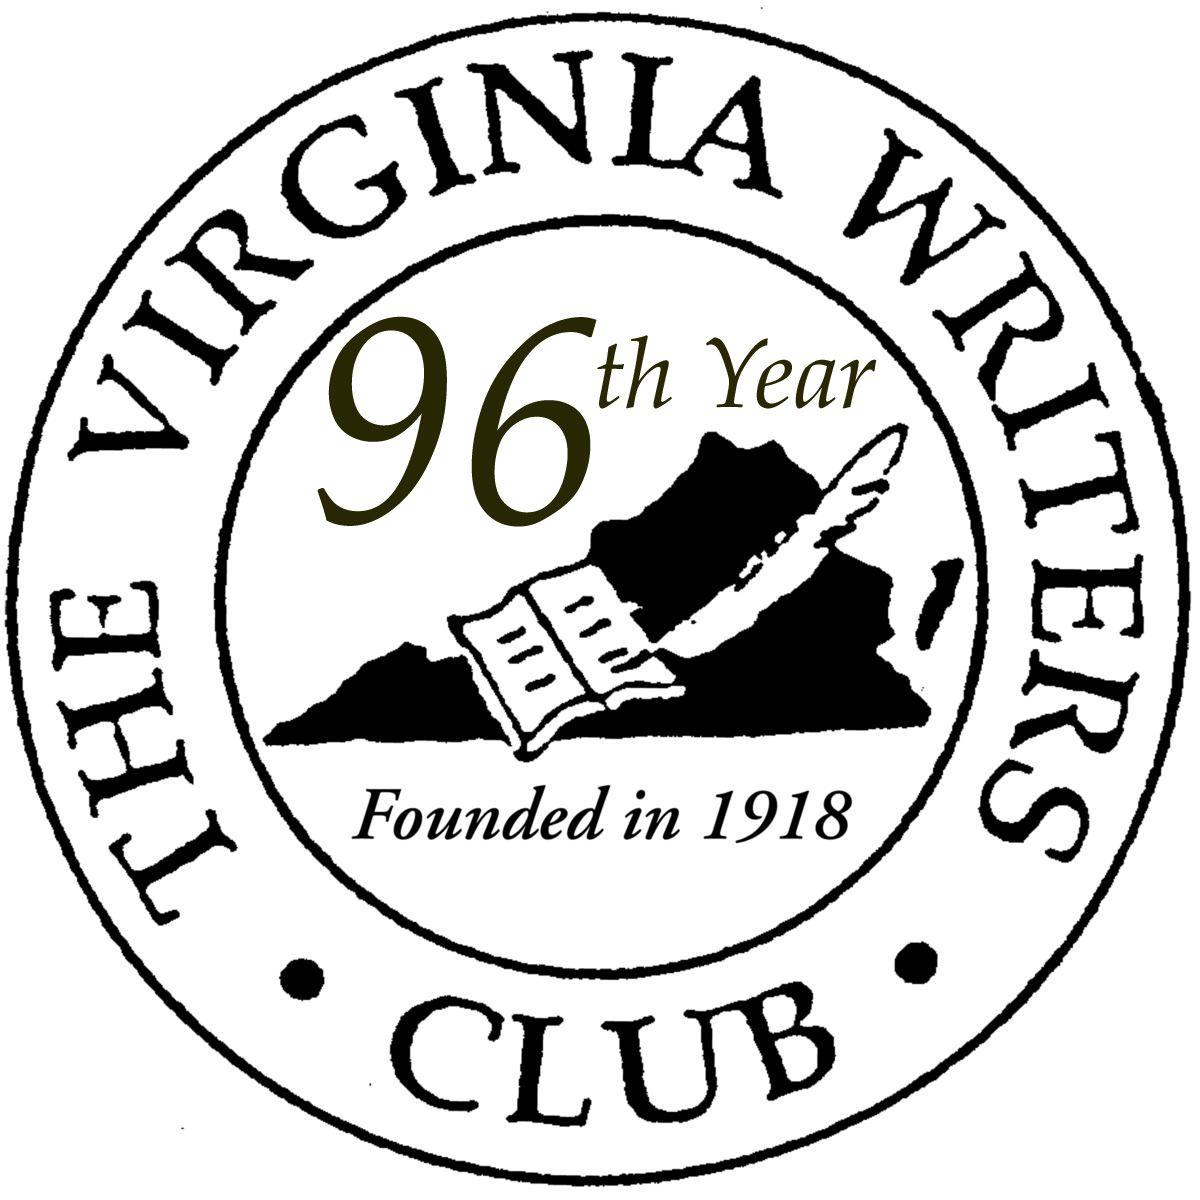 Pin by Lisa Mistry on Writerly stuff Writer, Club, Virginia